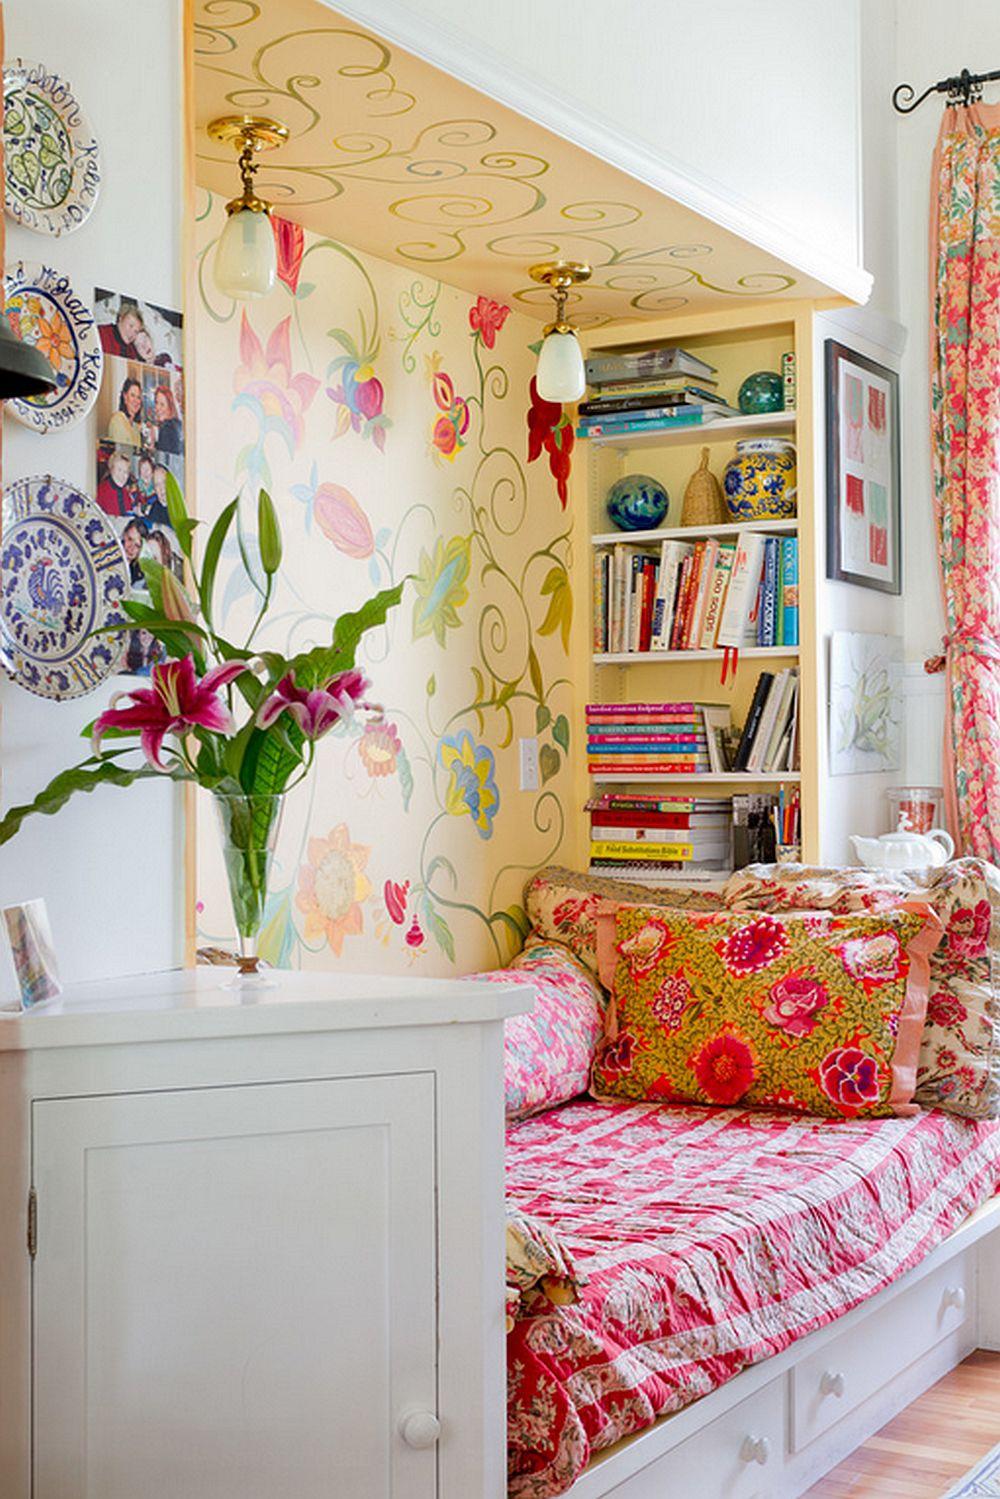 adelaparvu.com despre casa veche de artisti din Boston cu pereti pictati cu flori, Foto Rikki Snyder (4)